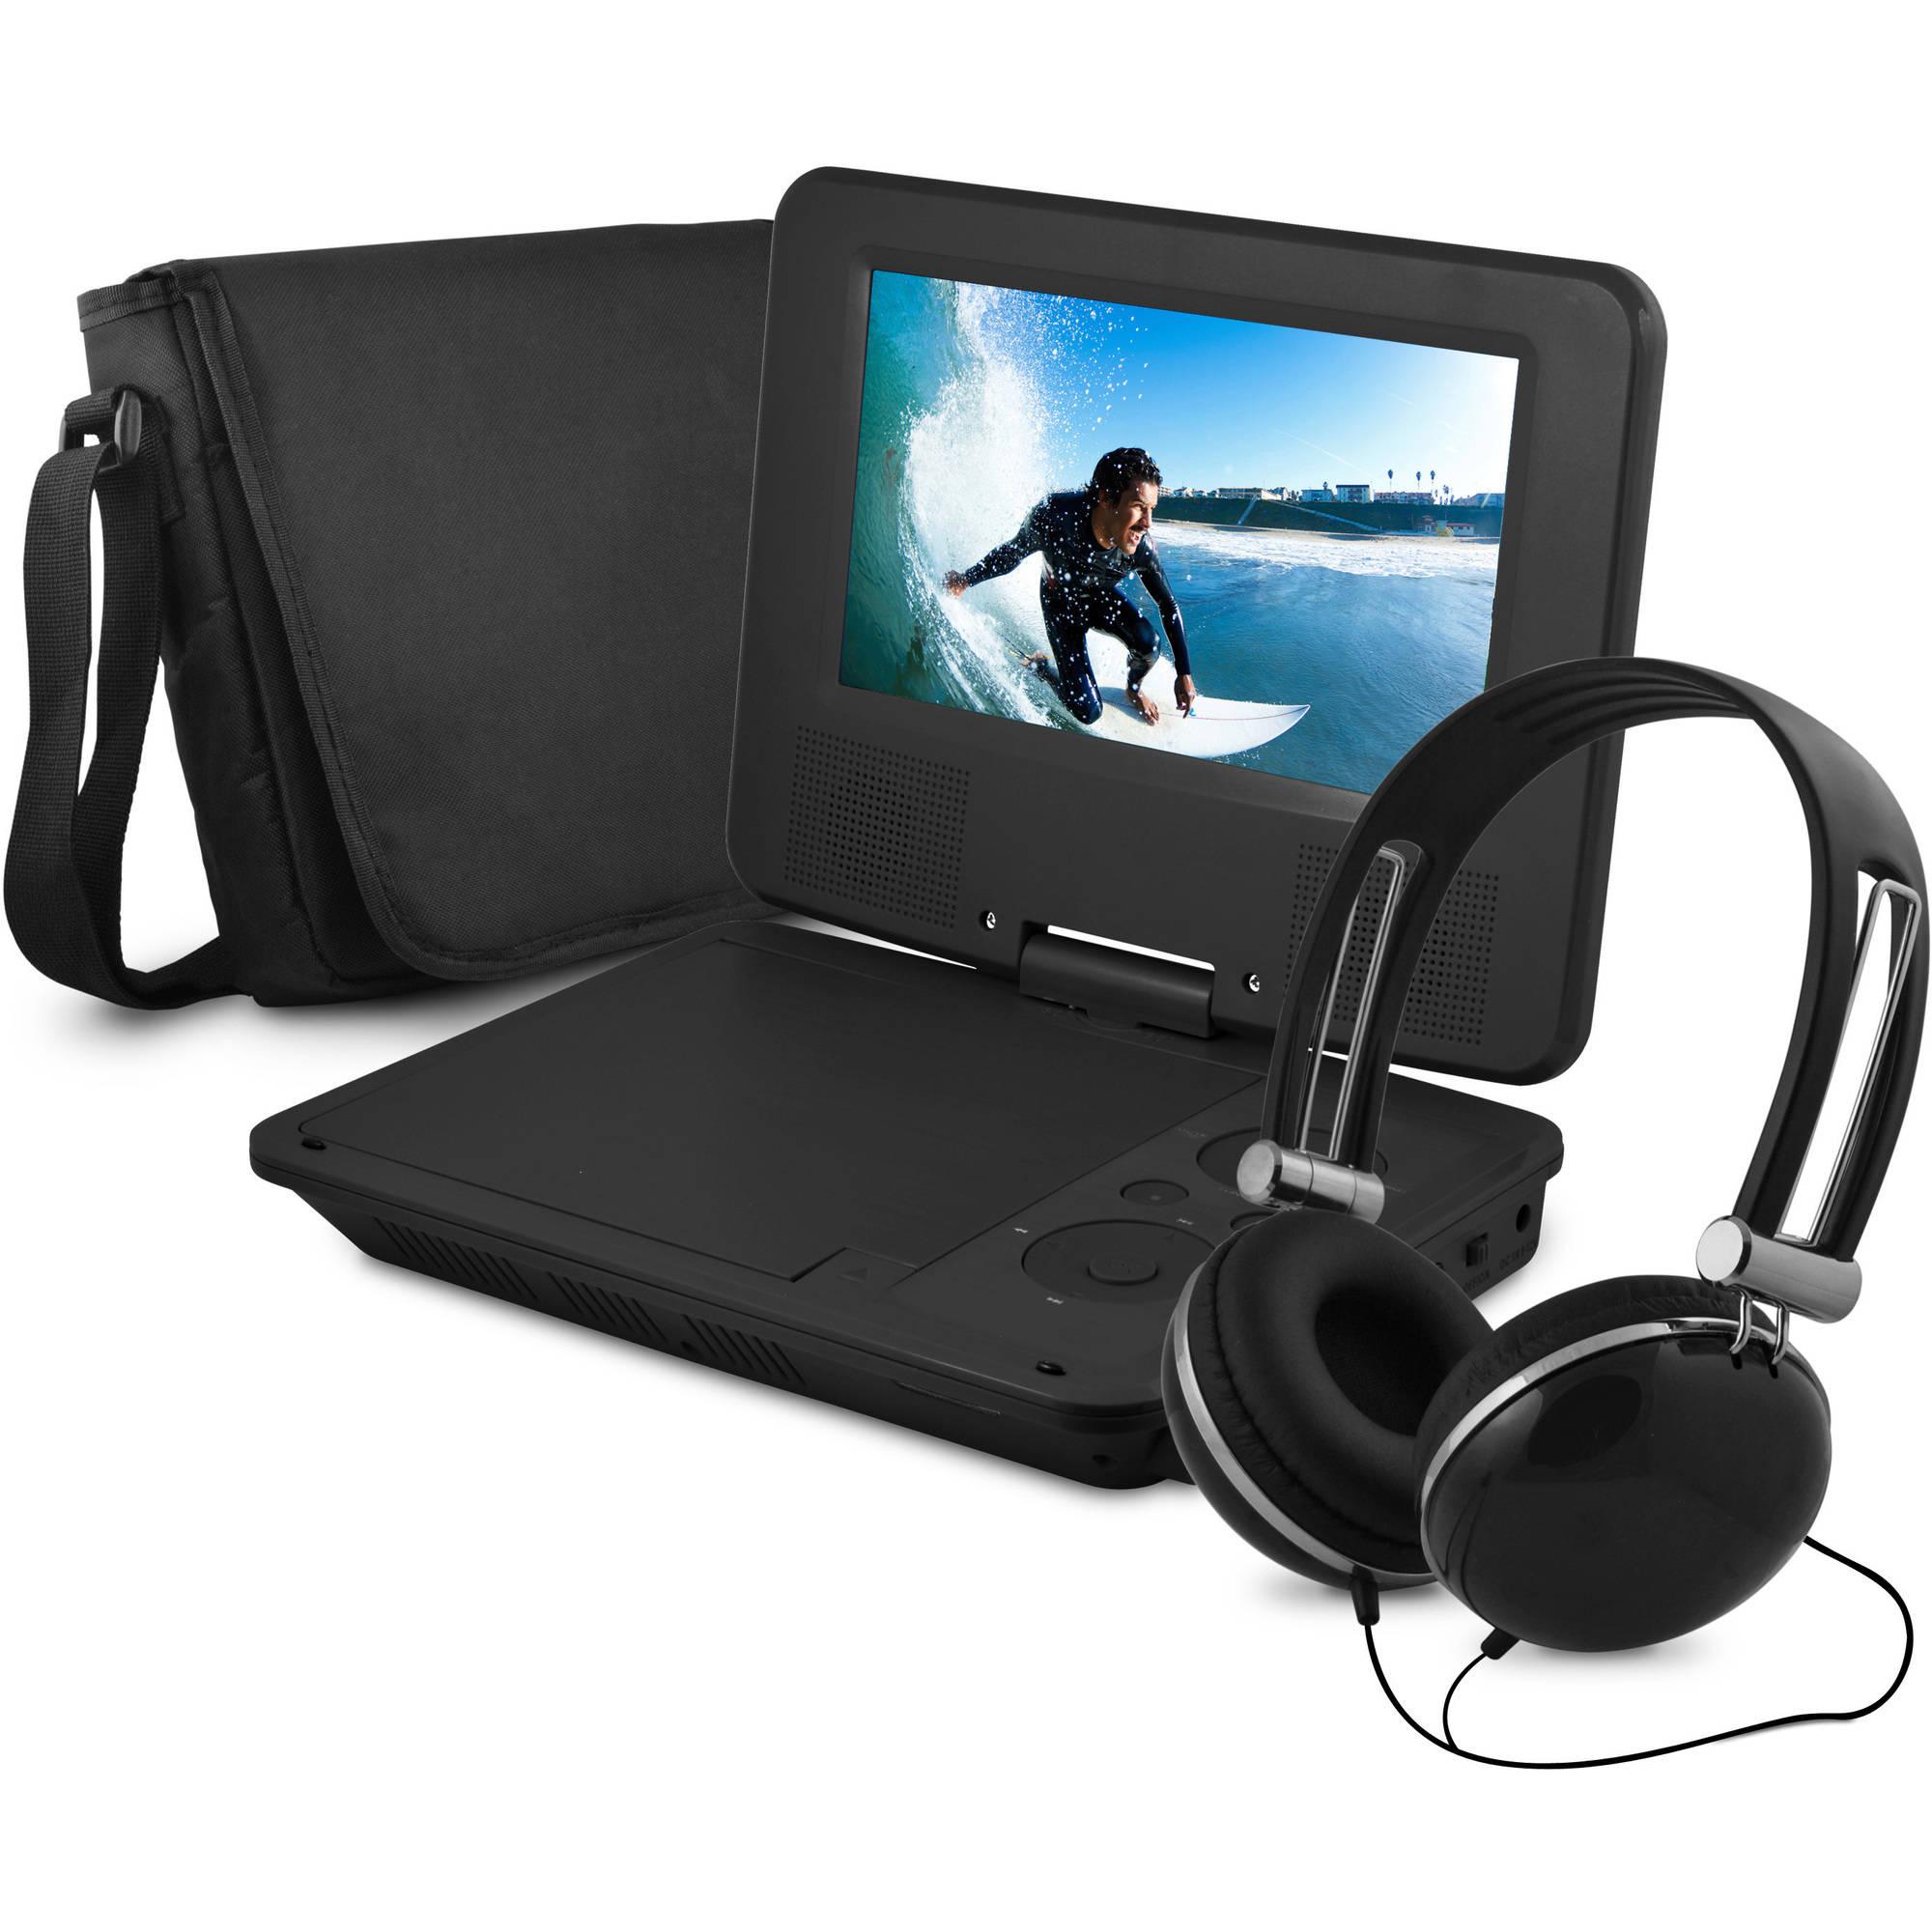 onn 7 portable dvd player with matching headphones and bag walmartcom